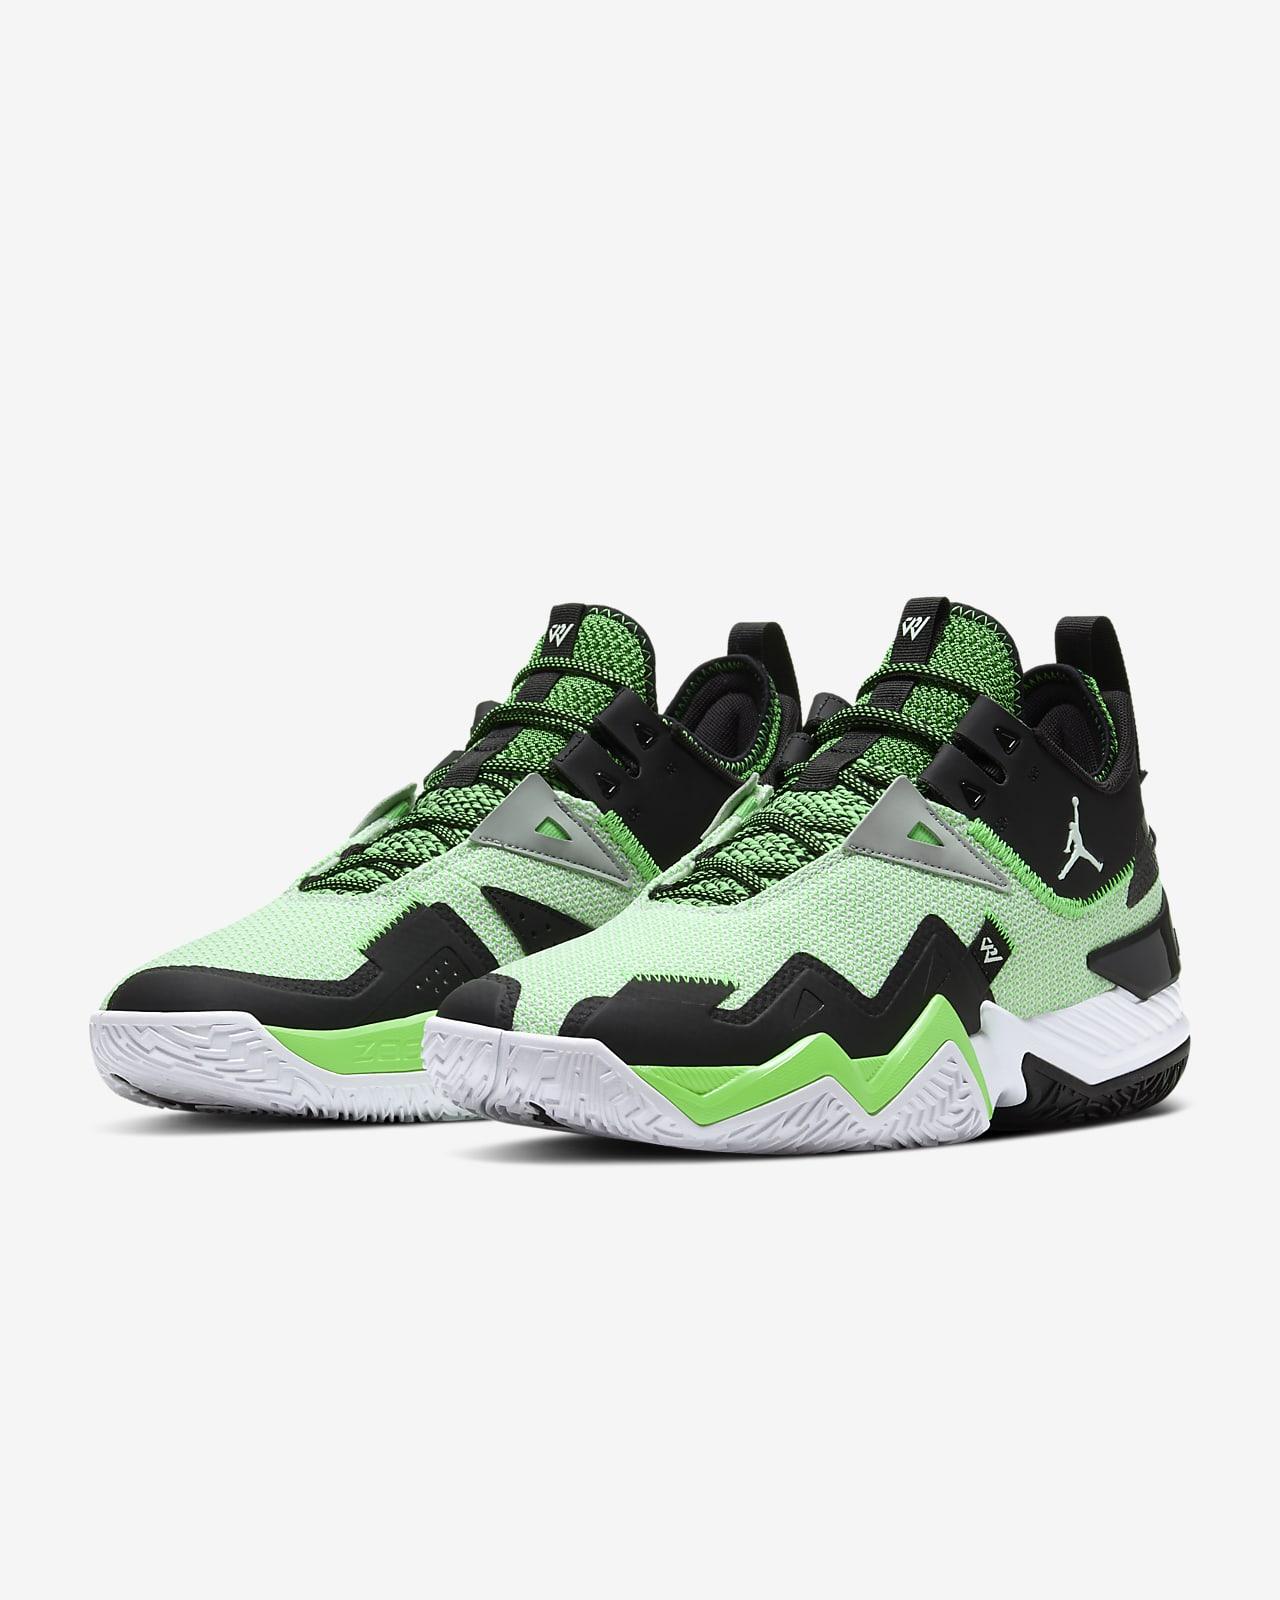 Chaussure de Basketball Jordan Westbrook One Take vert pour